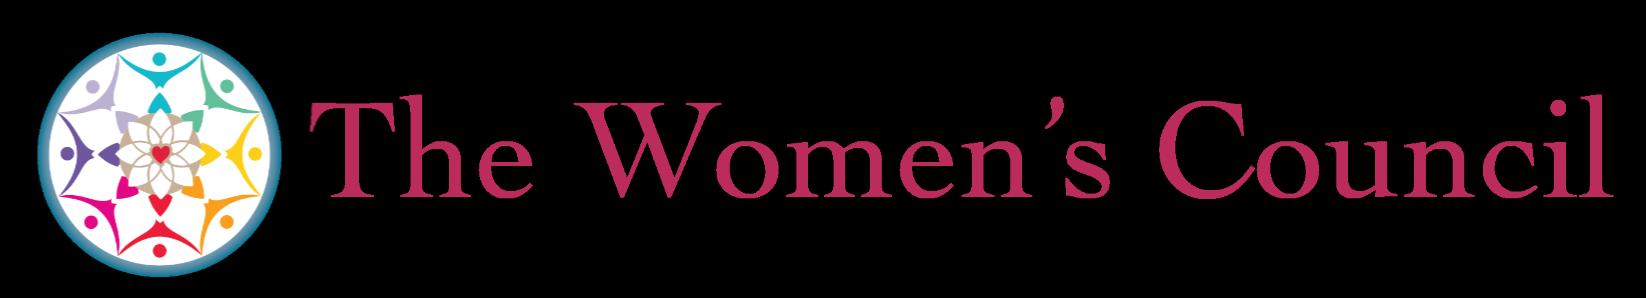 The Women's Council